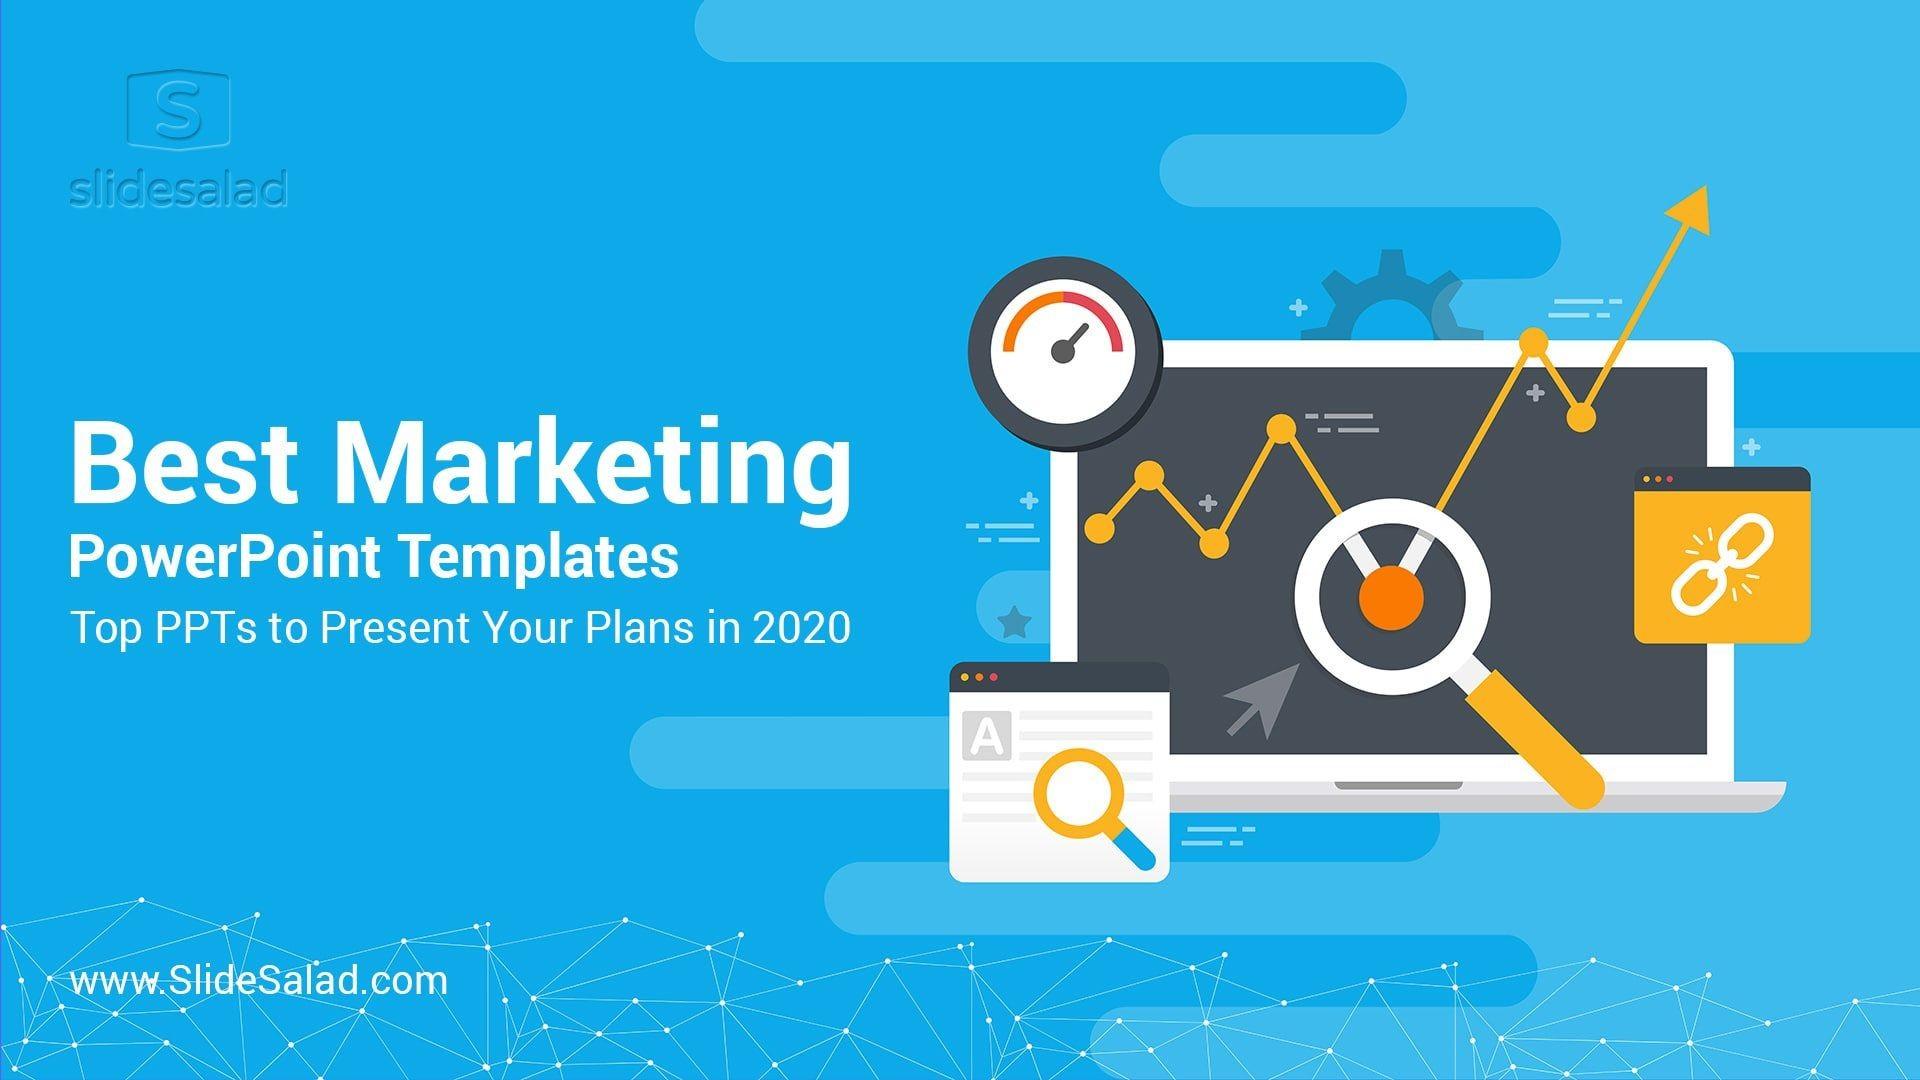 001 Incredible Digital Marketing Plan Template Ppt Picture  Presentation Free Slideshare1920